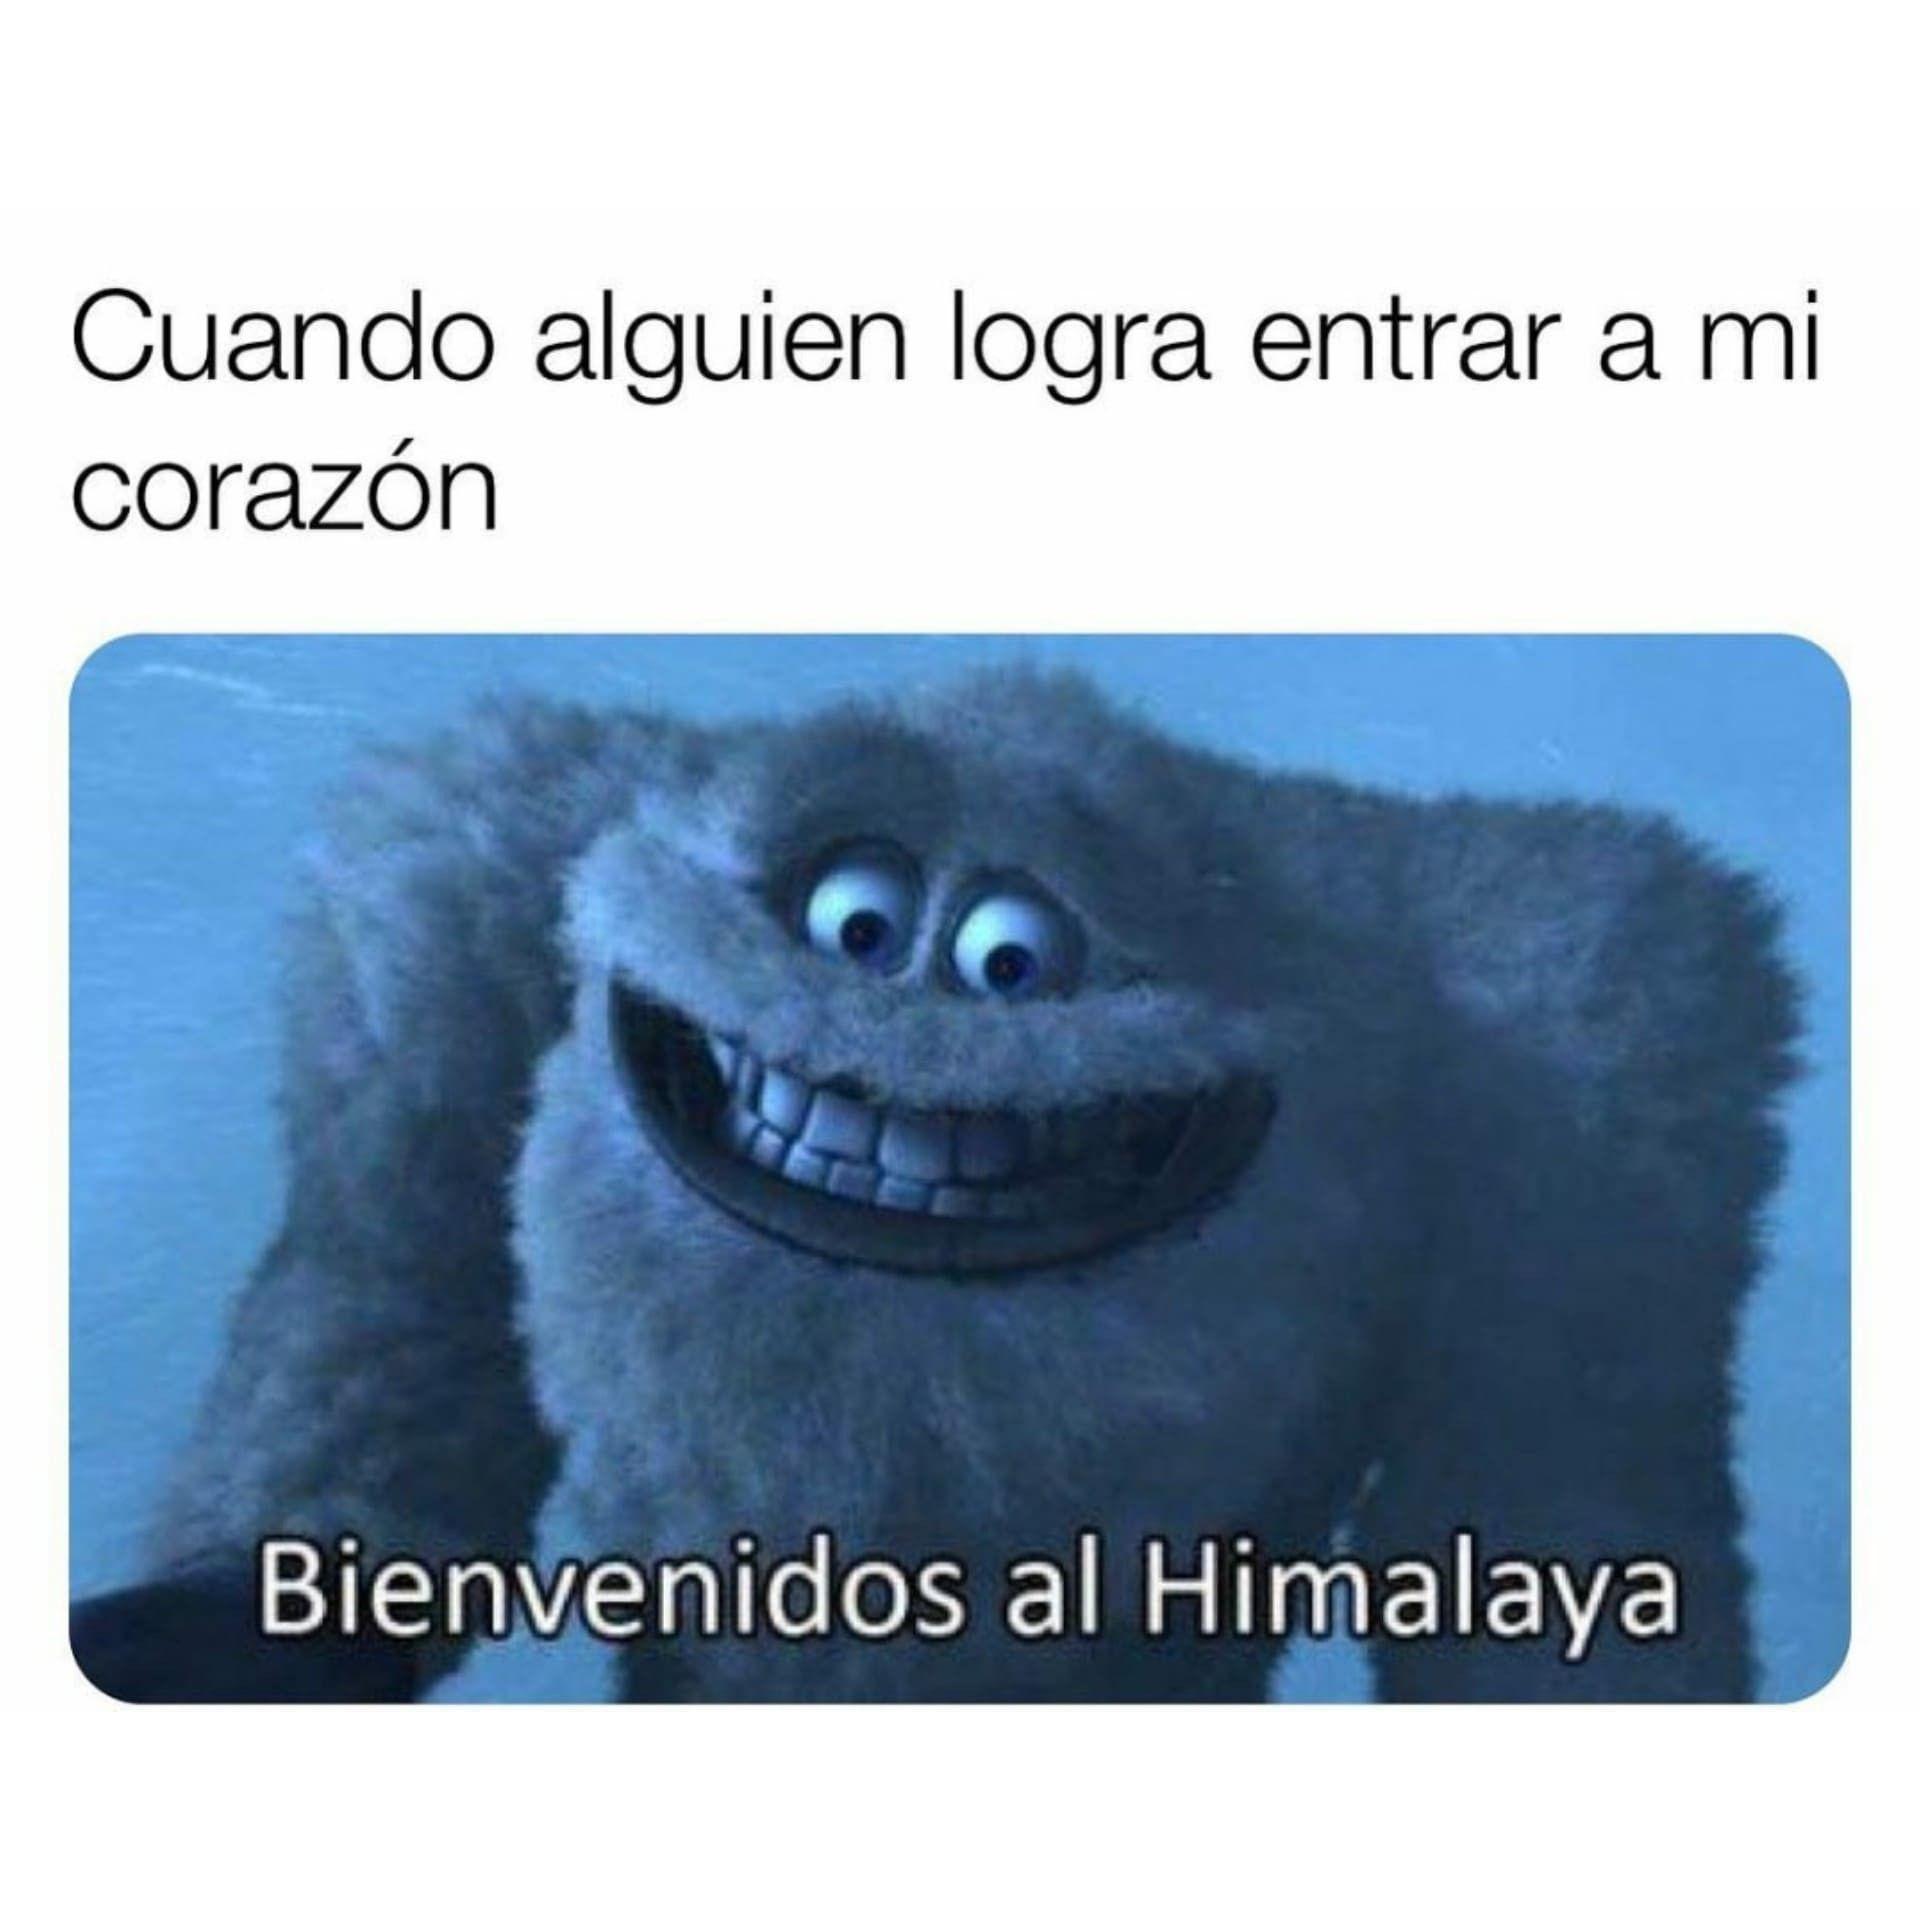 Pin De Alex Landazuri Yzarduy En Imagenes De Memes En Espanol Memes Divertidos Meme Gracioso Meme Divertido